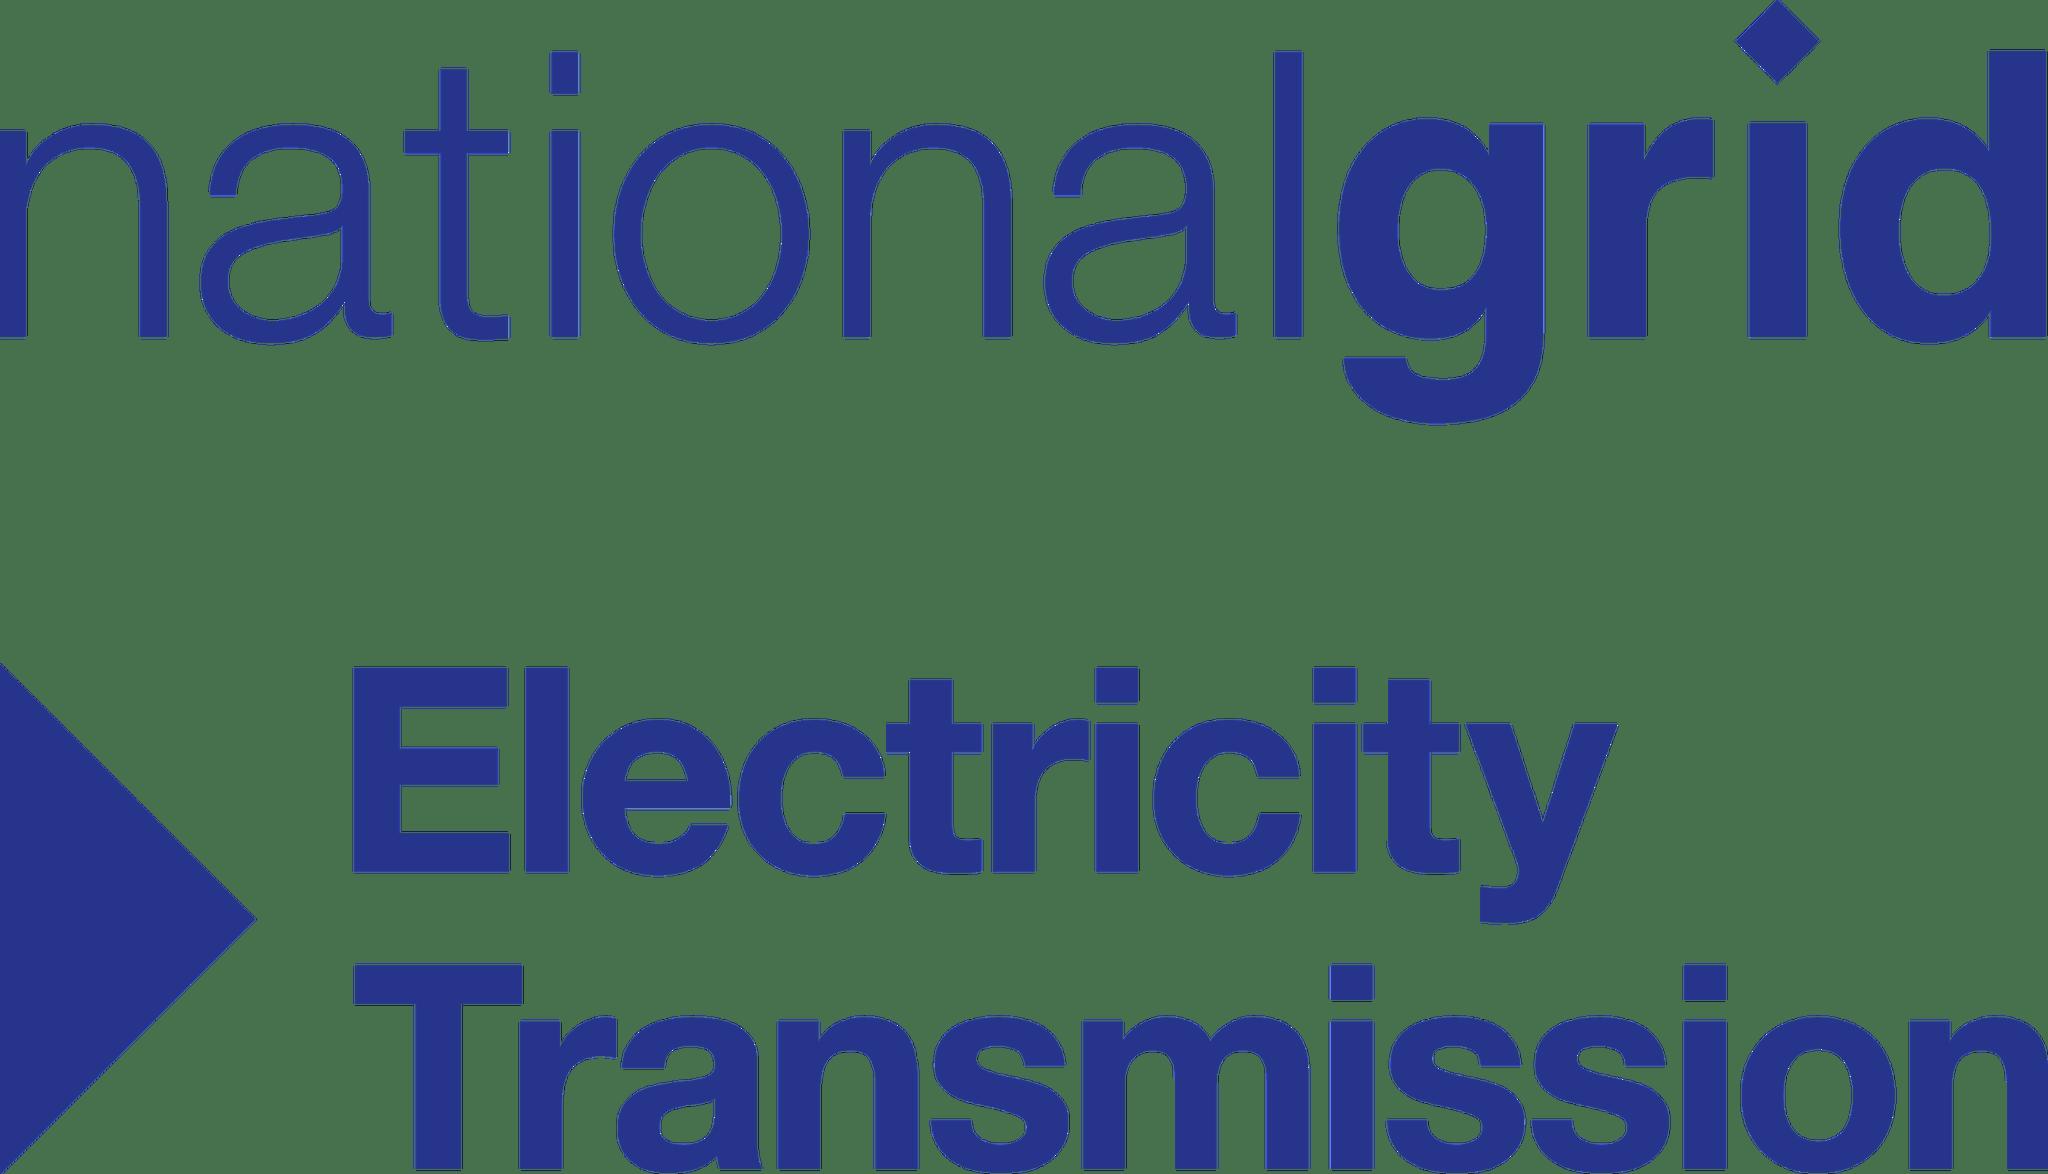 National Grid Electricity Transmission